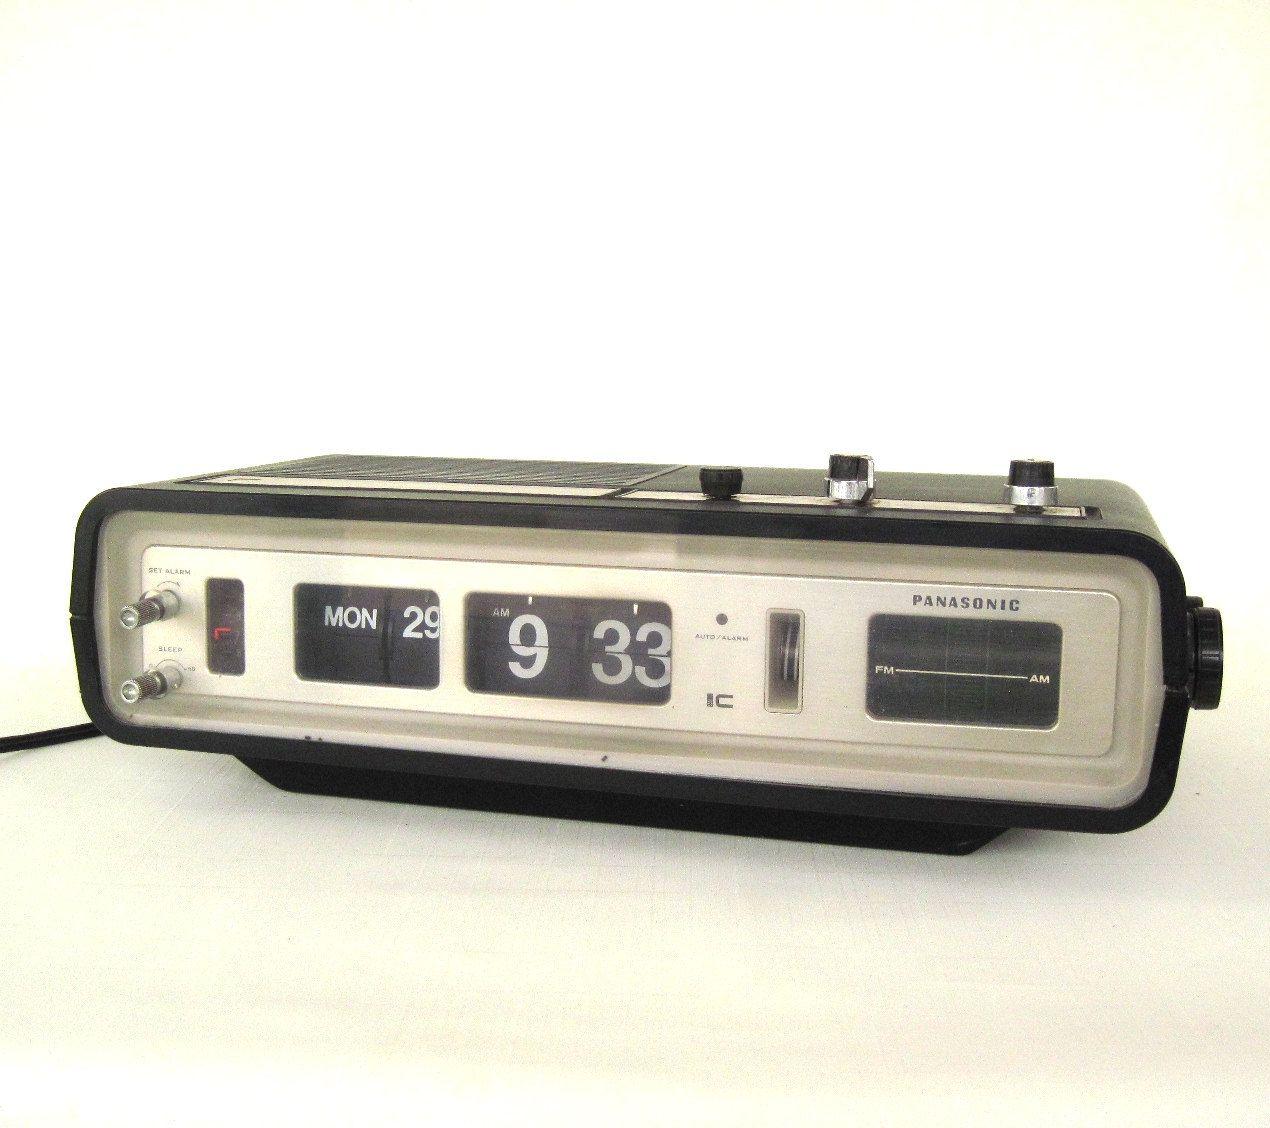 Panasonic Alarm Clock Radio Flip Number RC6551 (as is, see